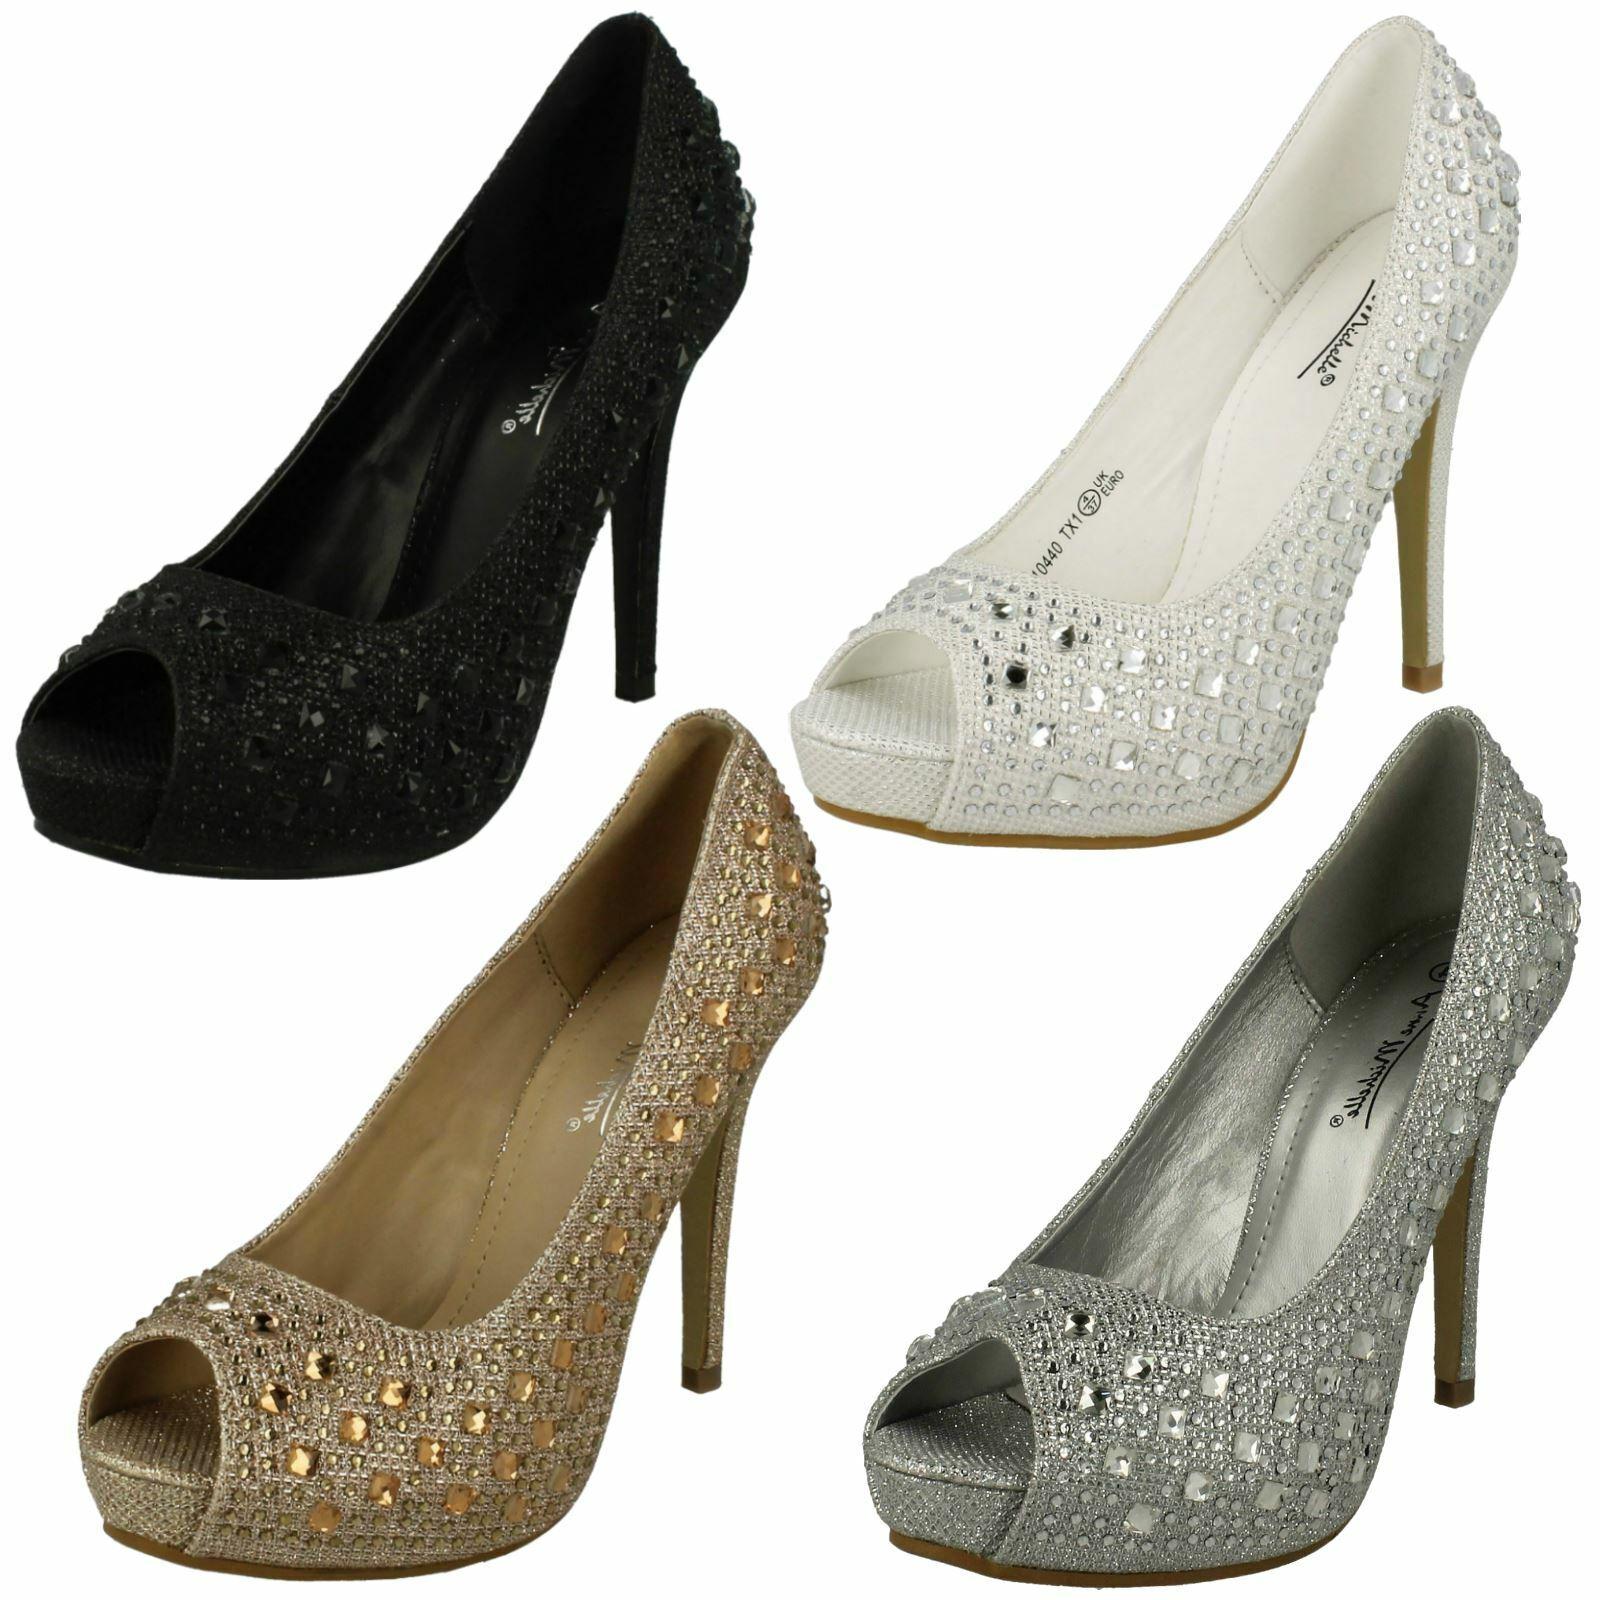 Ladies Anne Michelle Peep Toe Court Shoes With Gem Detail